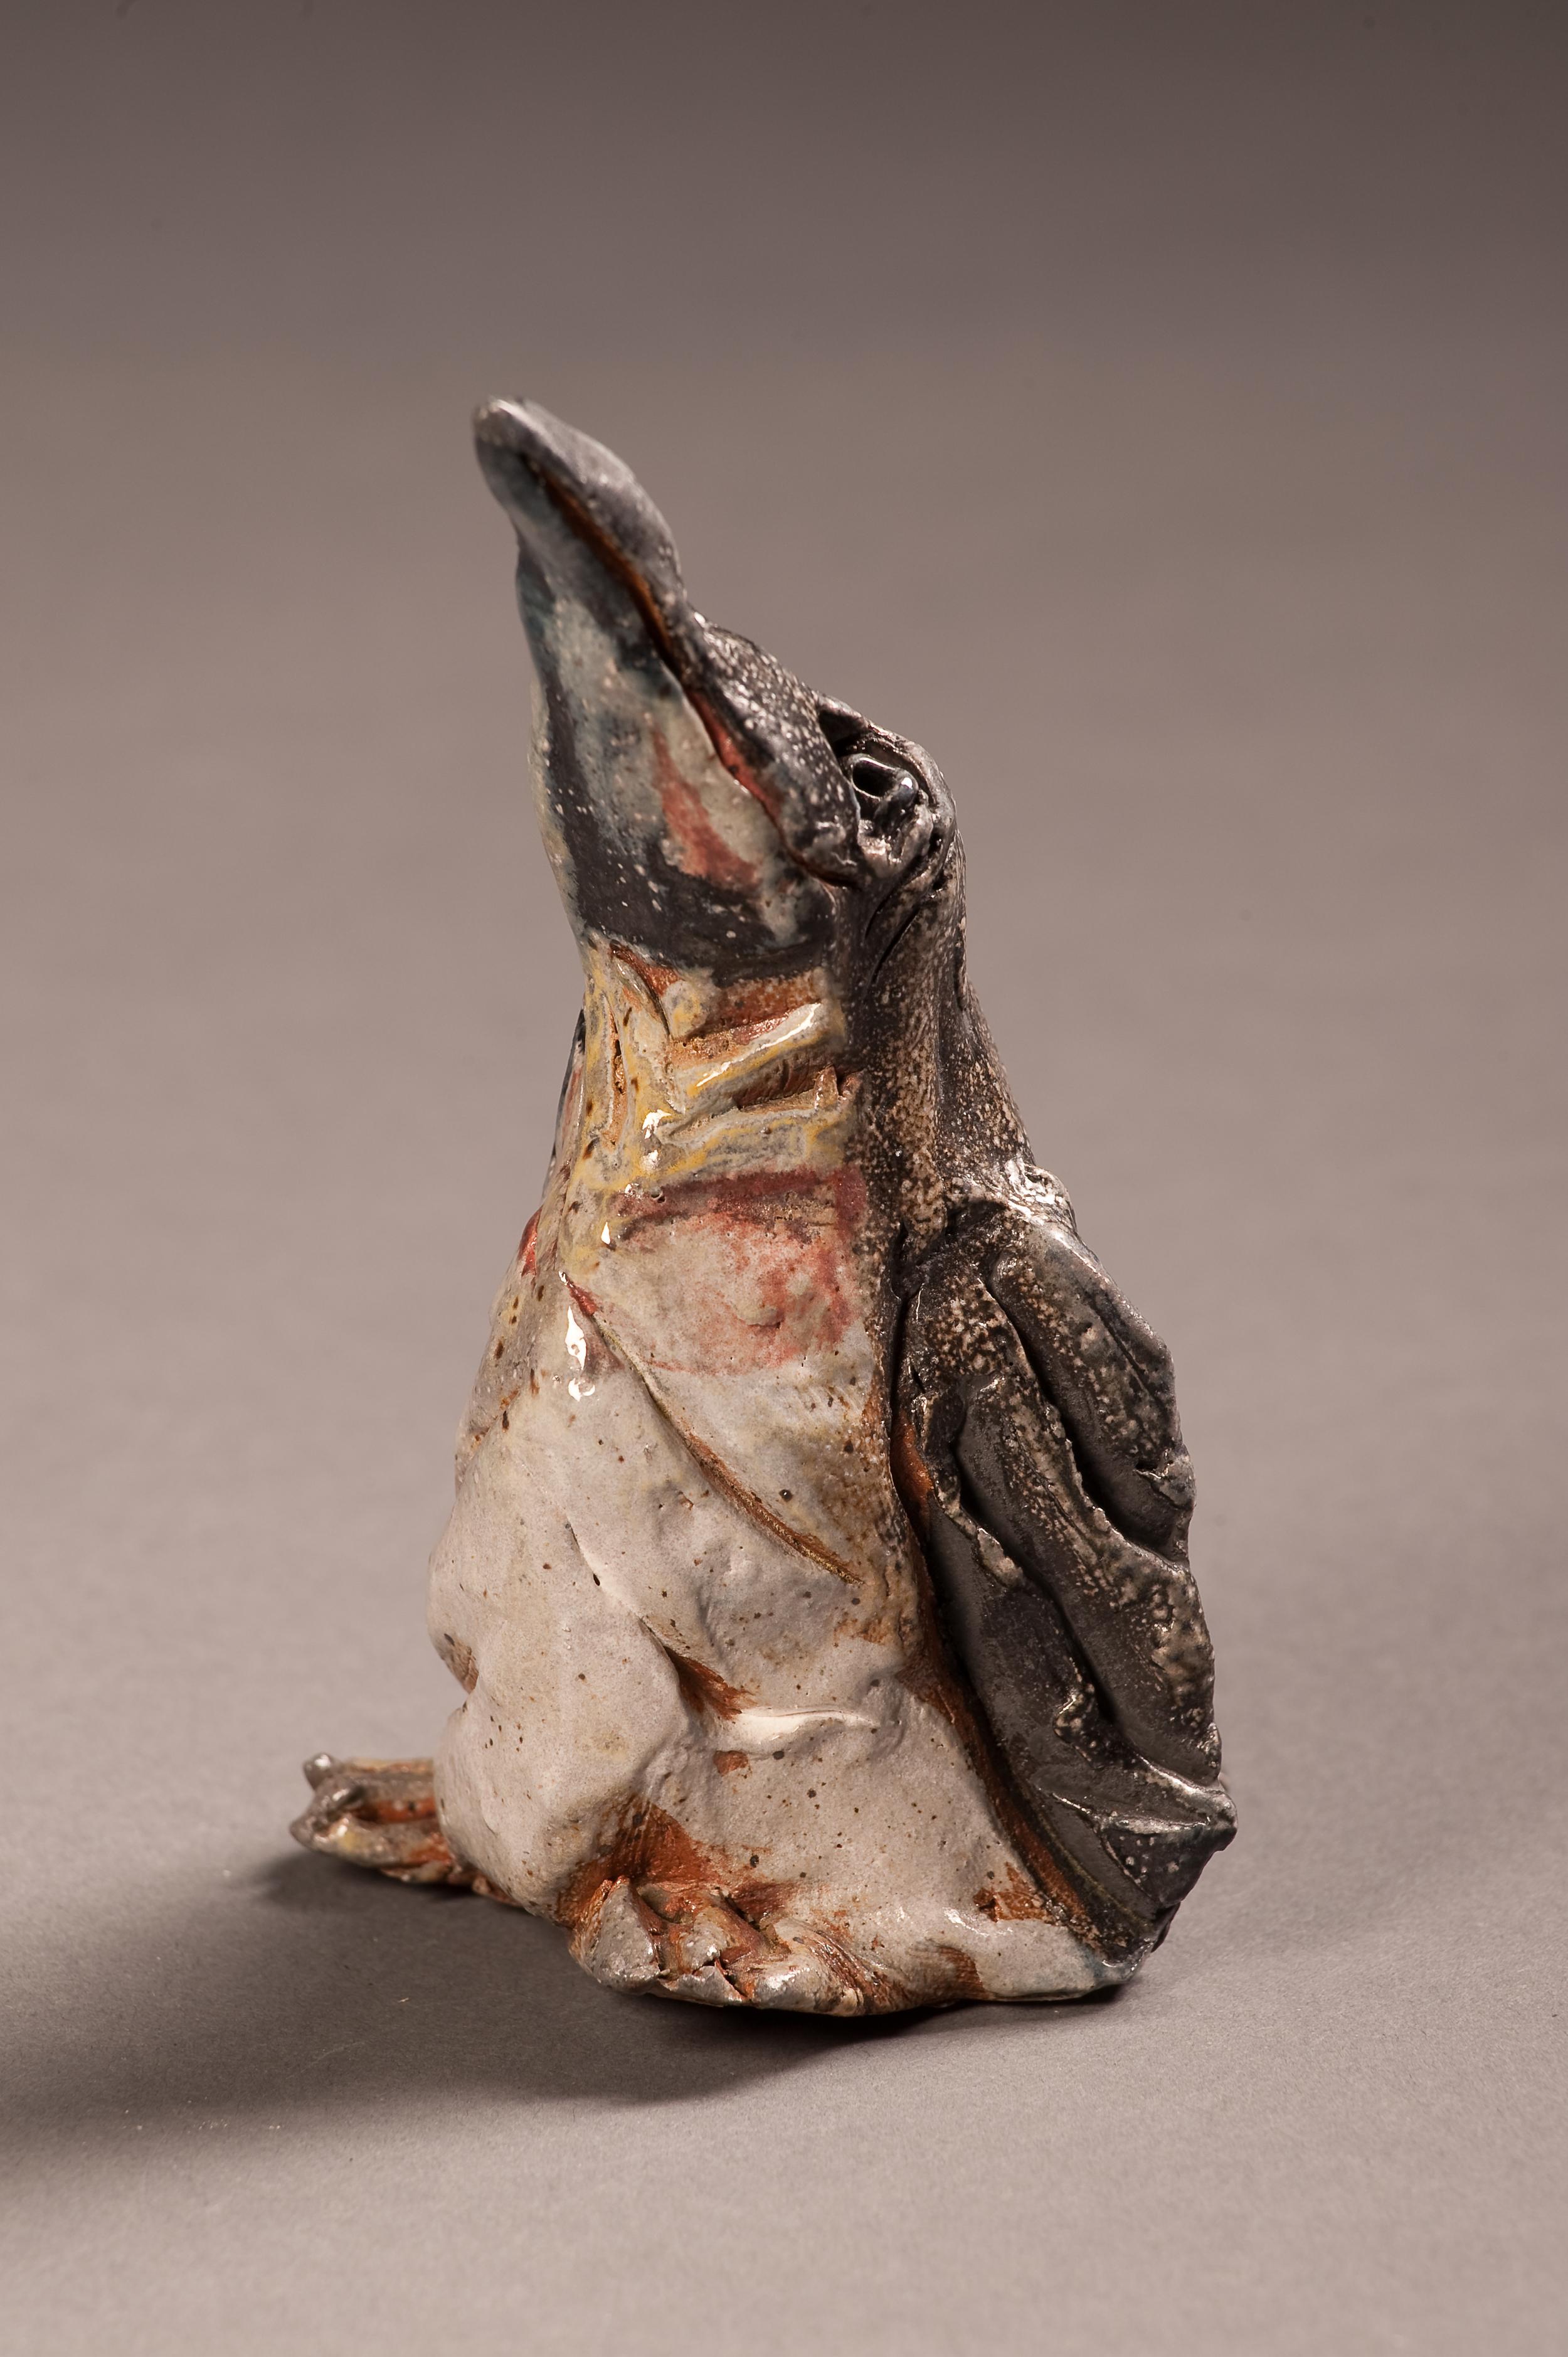 Pete - Penguin